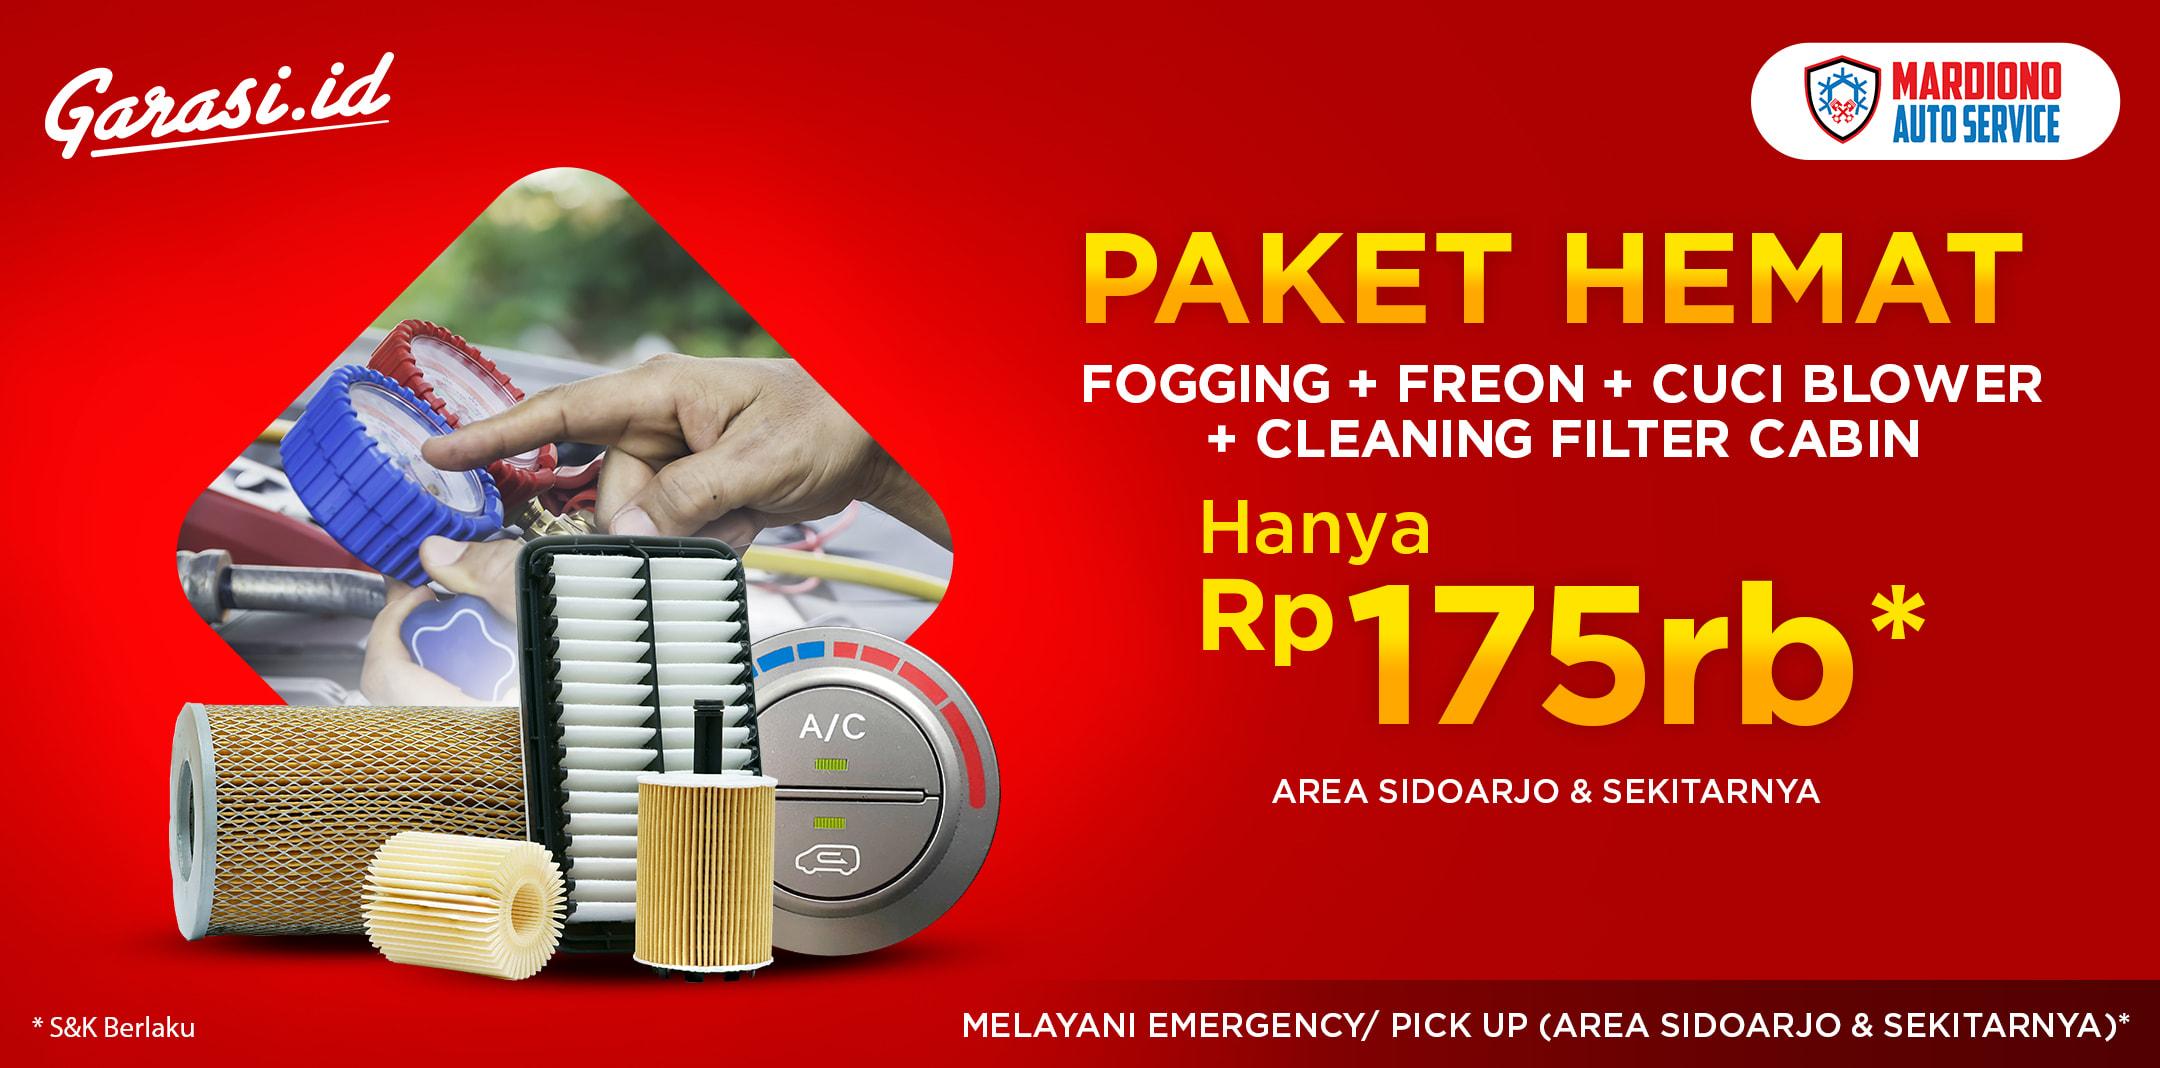 Fogging + Freon + Cuci Blower + Cleaning Filter Cabin Hanya Rp 175.000